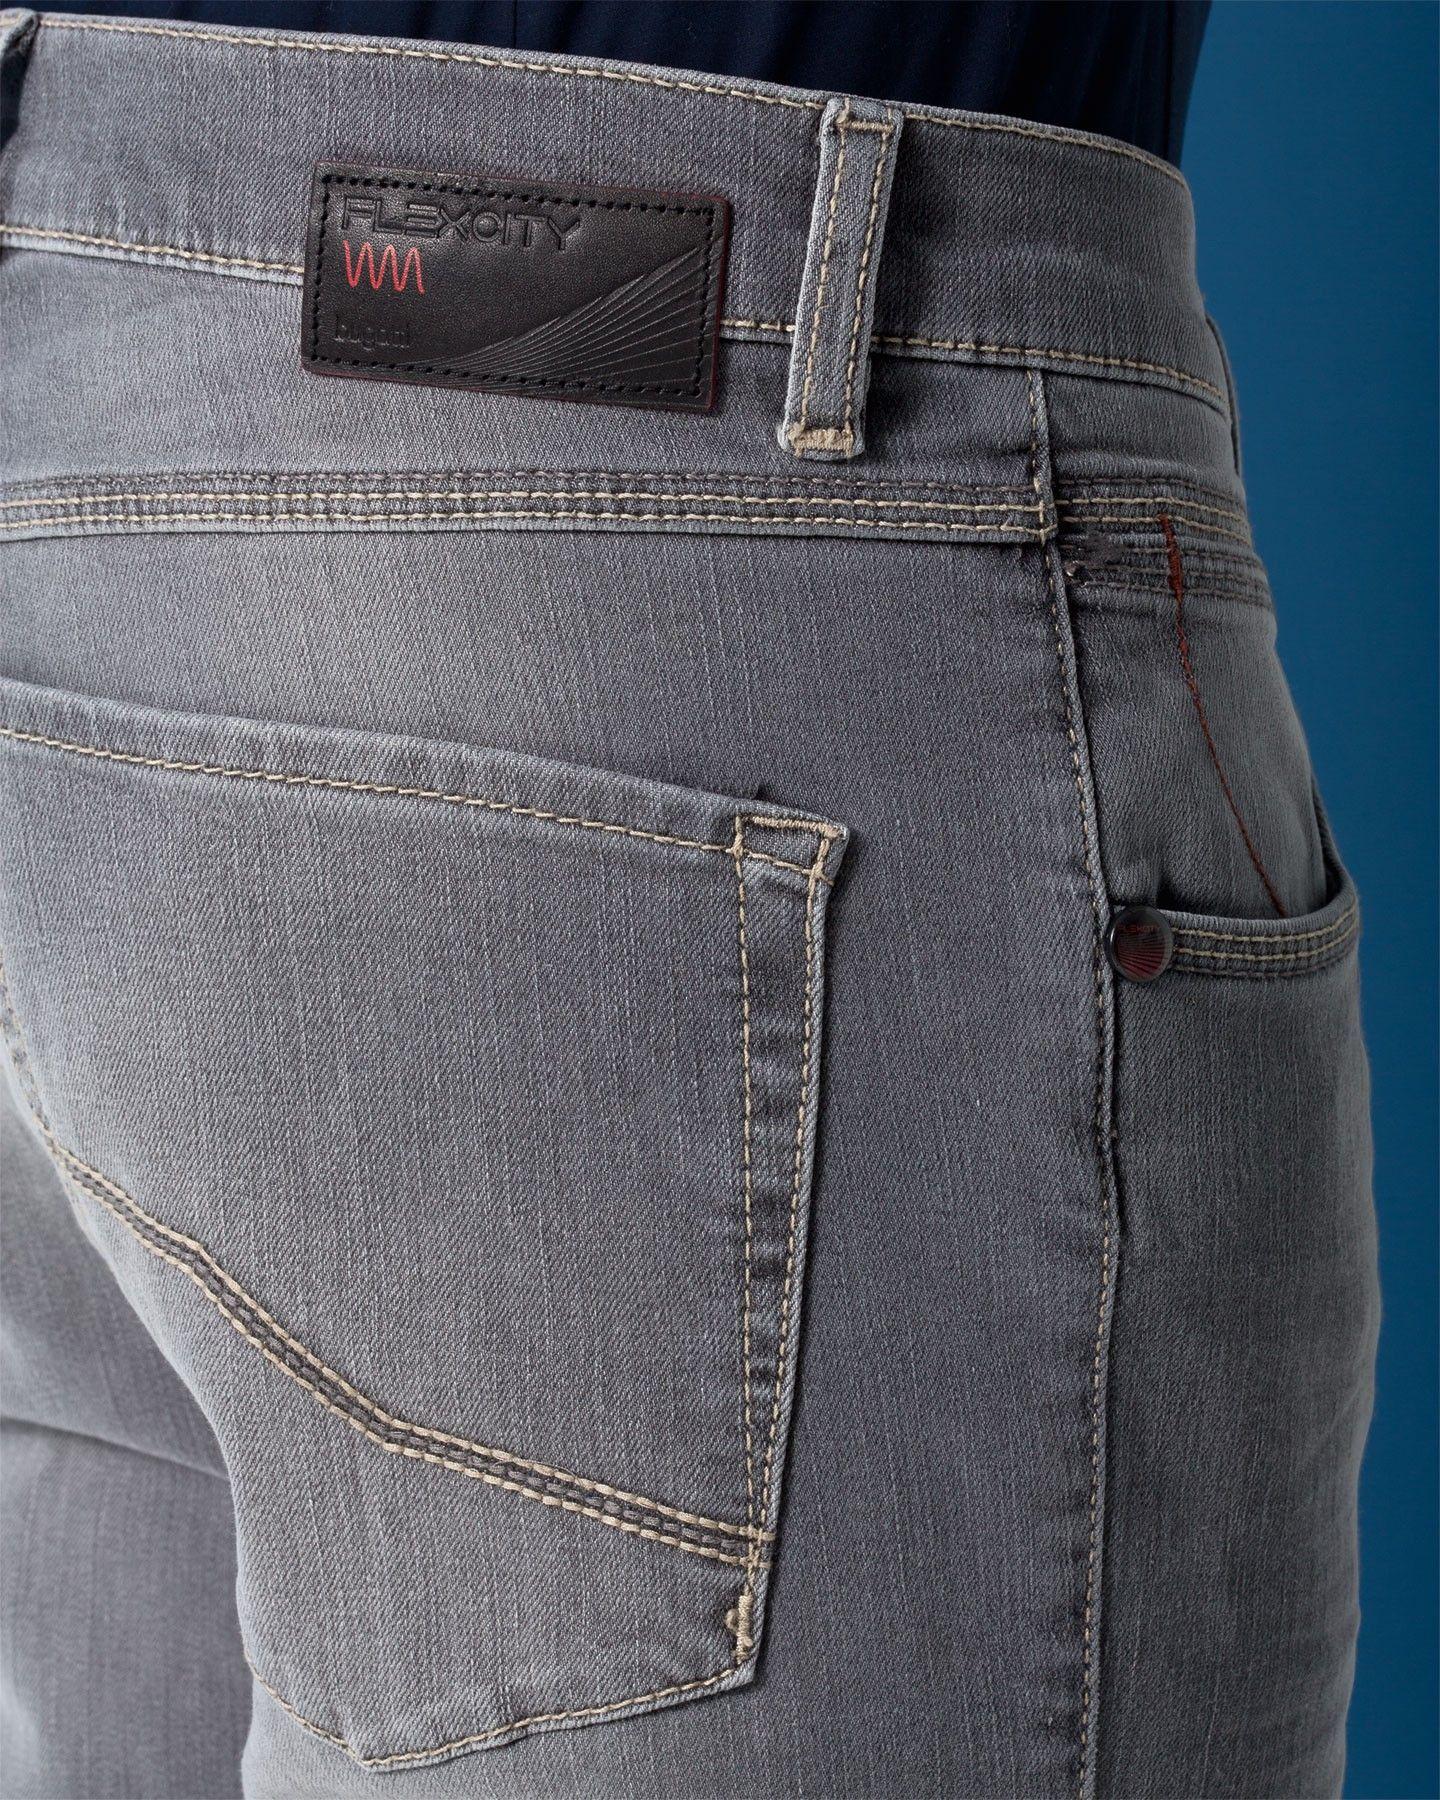 Bugatti - Herren Jeans  (Art. Nr.: 3038D-86676) – Bild 2